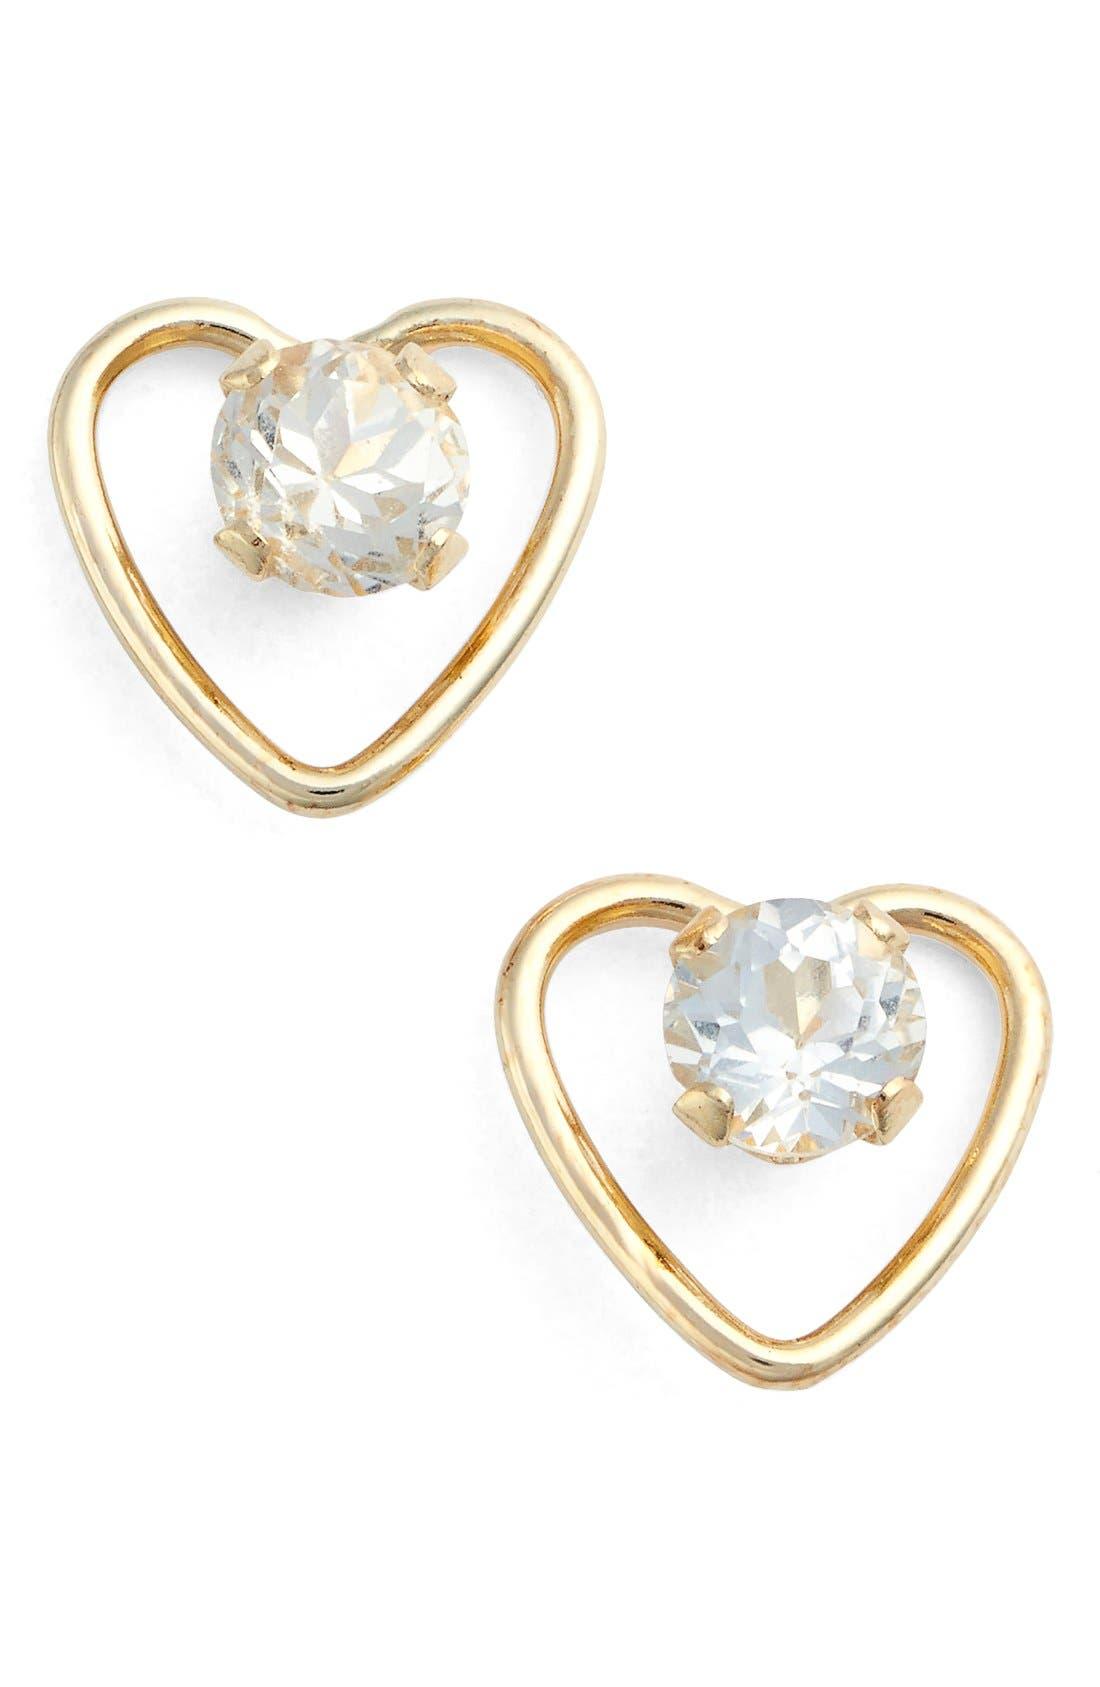 Cubic Zirconia Heart Earrings,                         Main,                         color, YELLOW GOLD